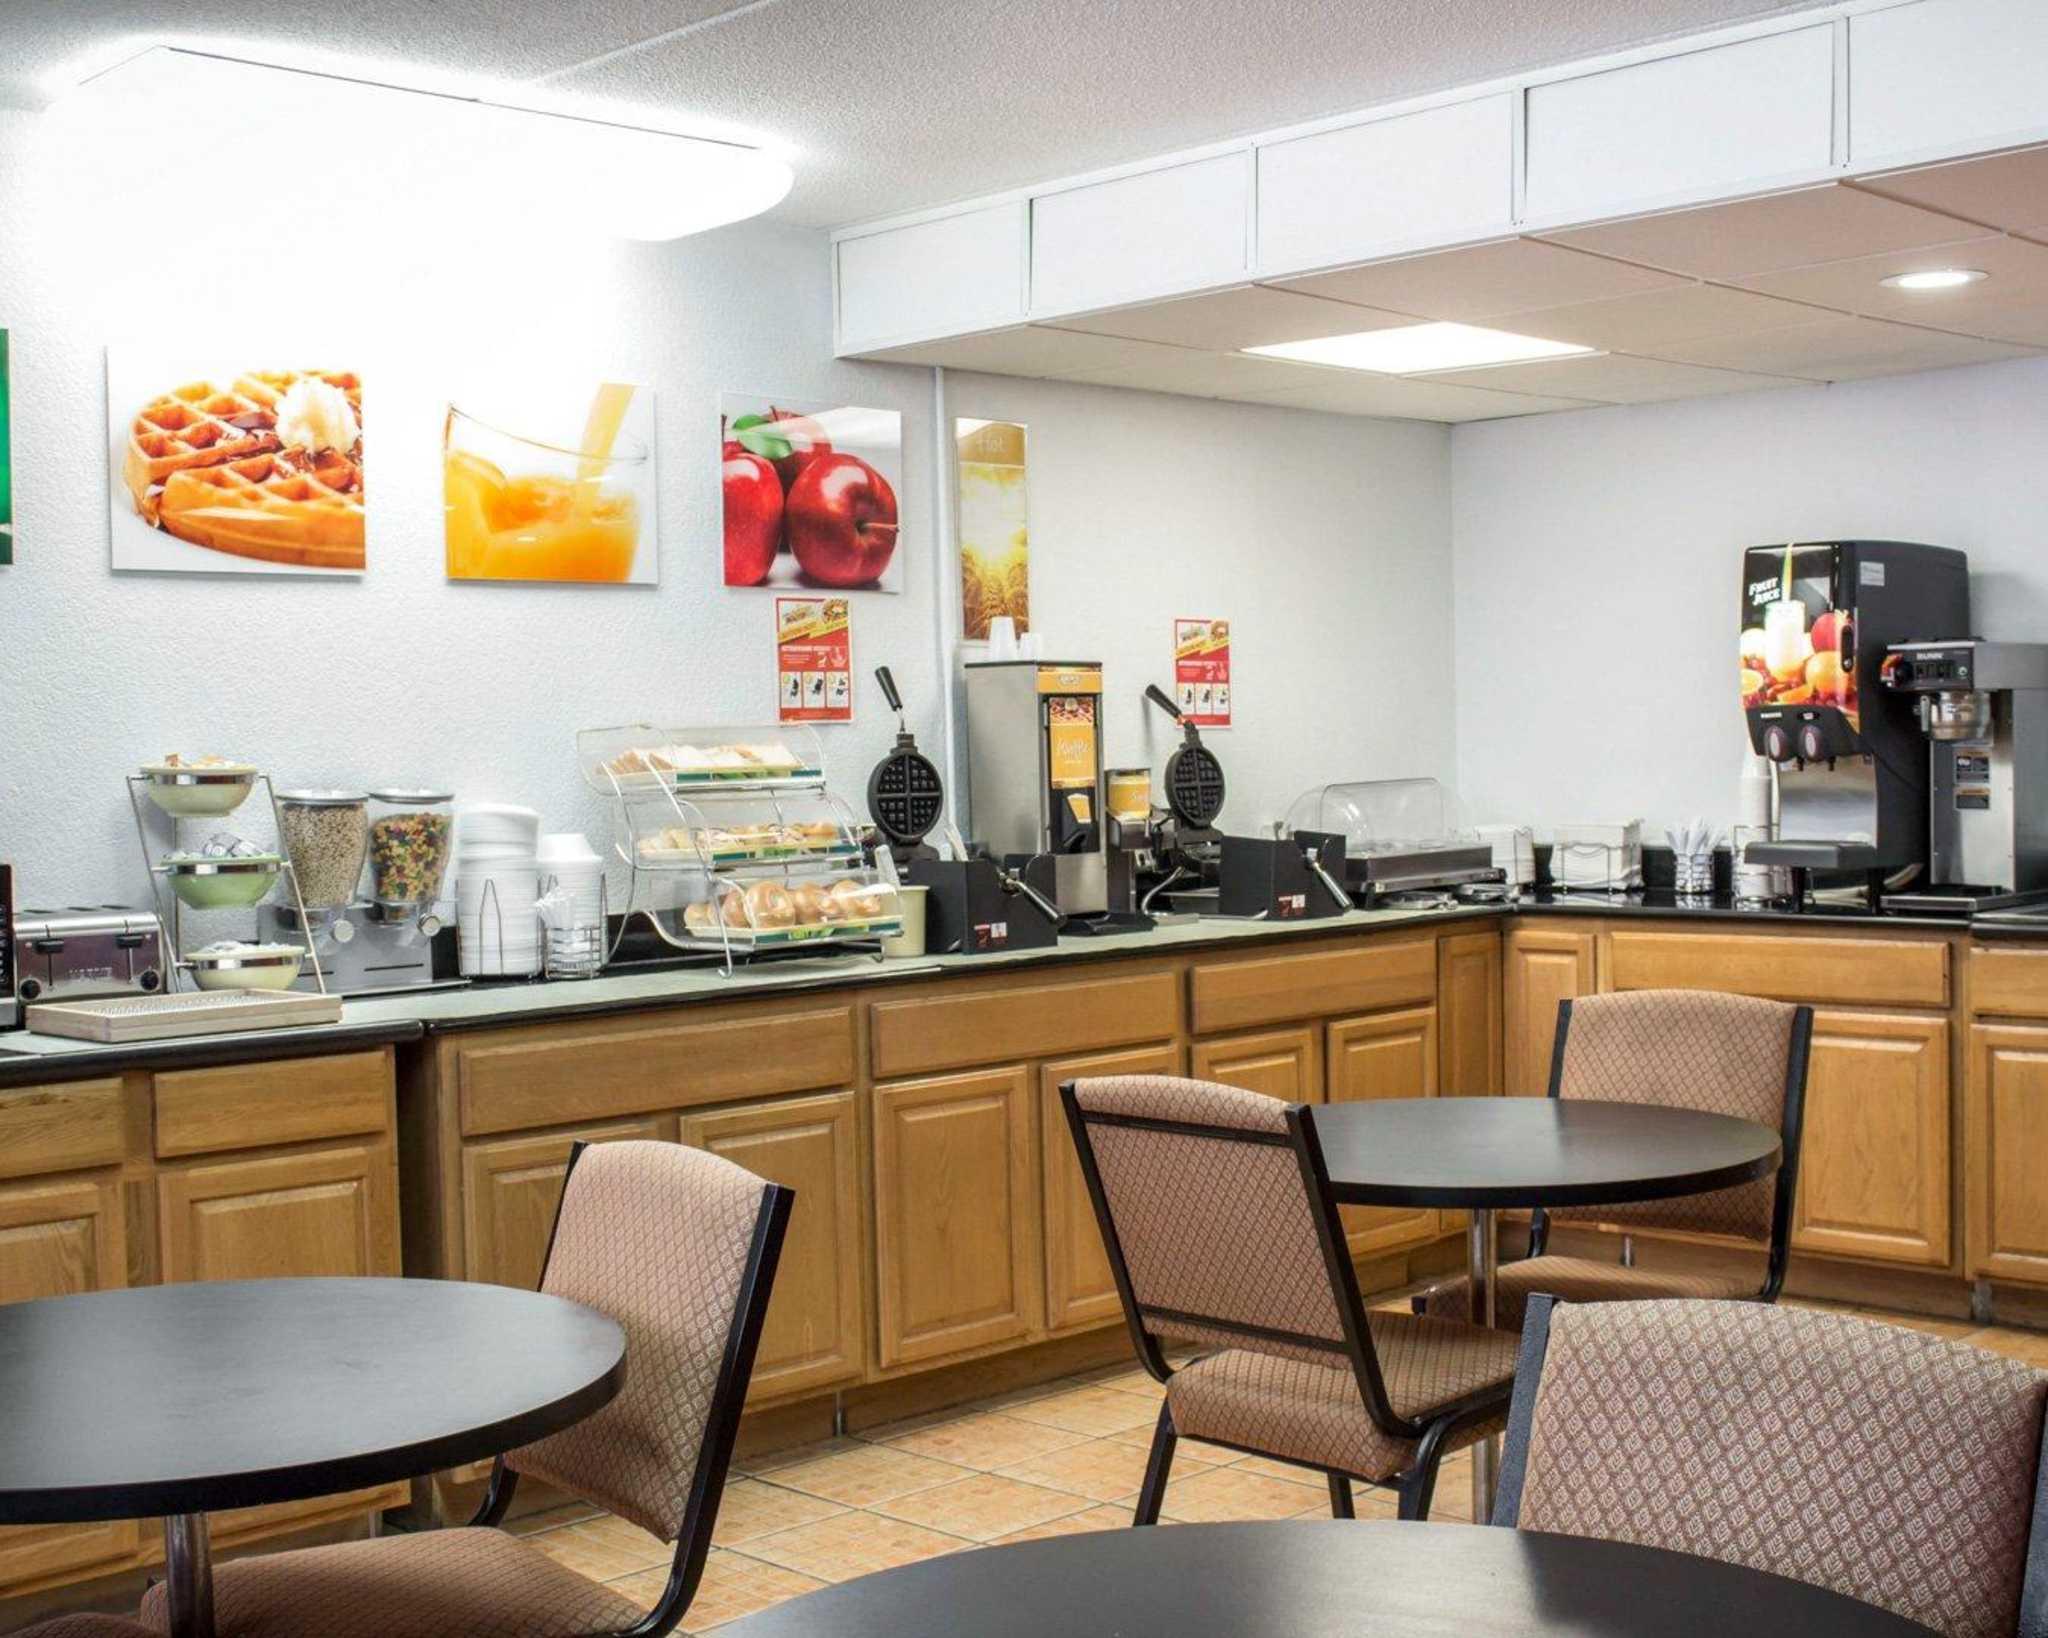 Quality Inn & Suites Fort Bragg image 14